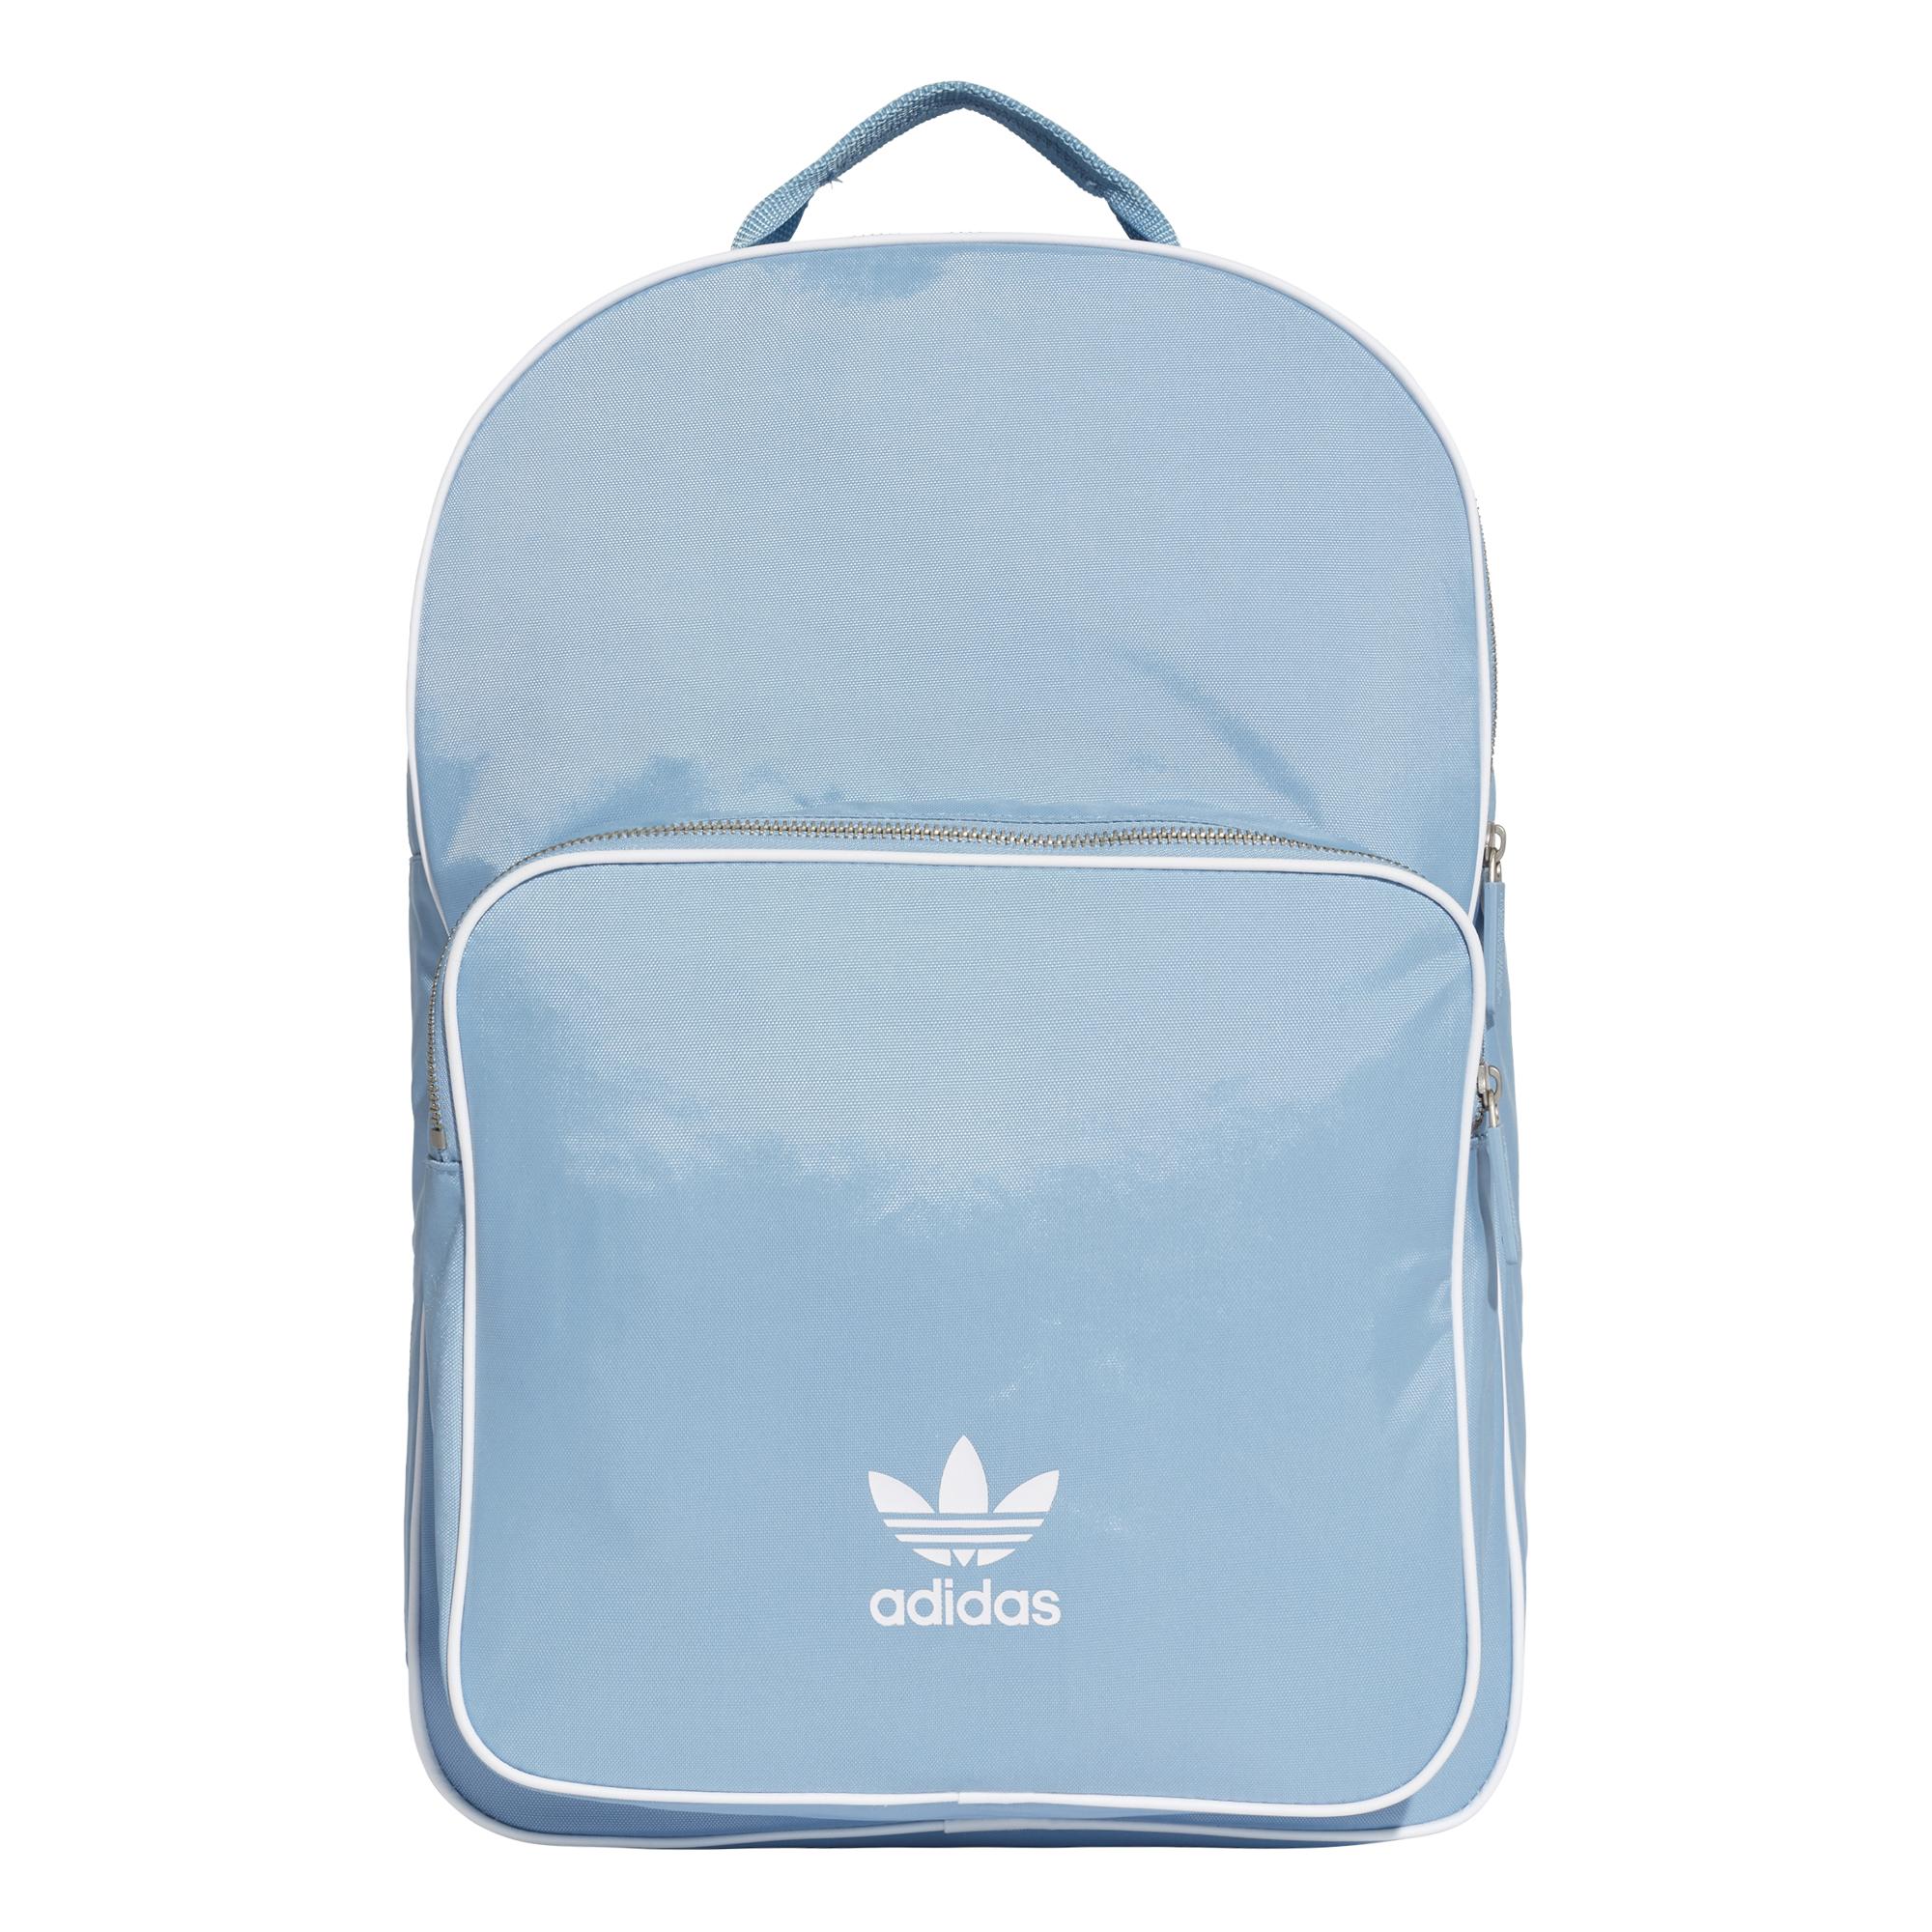 f9b7c1b280a Adidas Adicolor Classic Backpack Ash Blue - Boardvillage